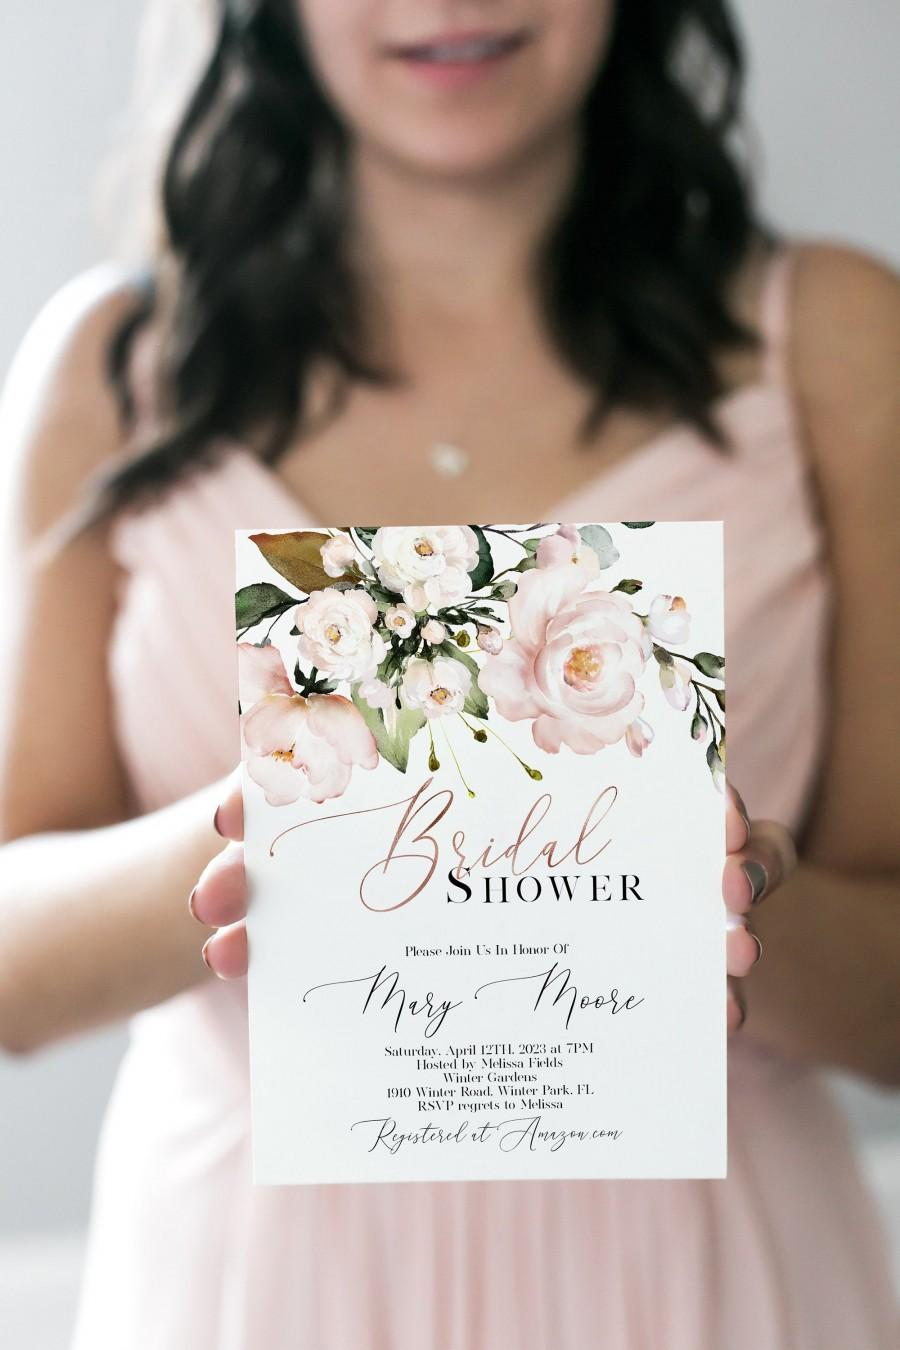 Wedding - Pink Bridal Shower Invitation Template, Boho Floral Bridal Shower, Rose Gold Greenery, Instant Download, Editable Template, Corjl, WP382